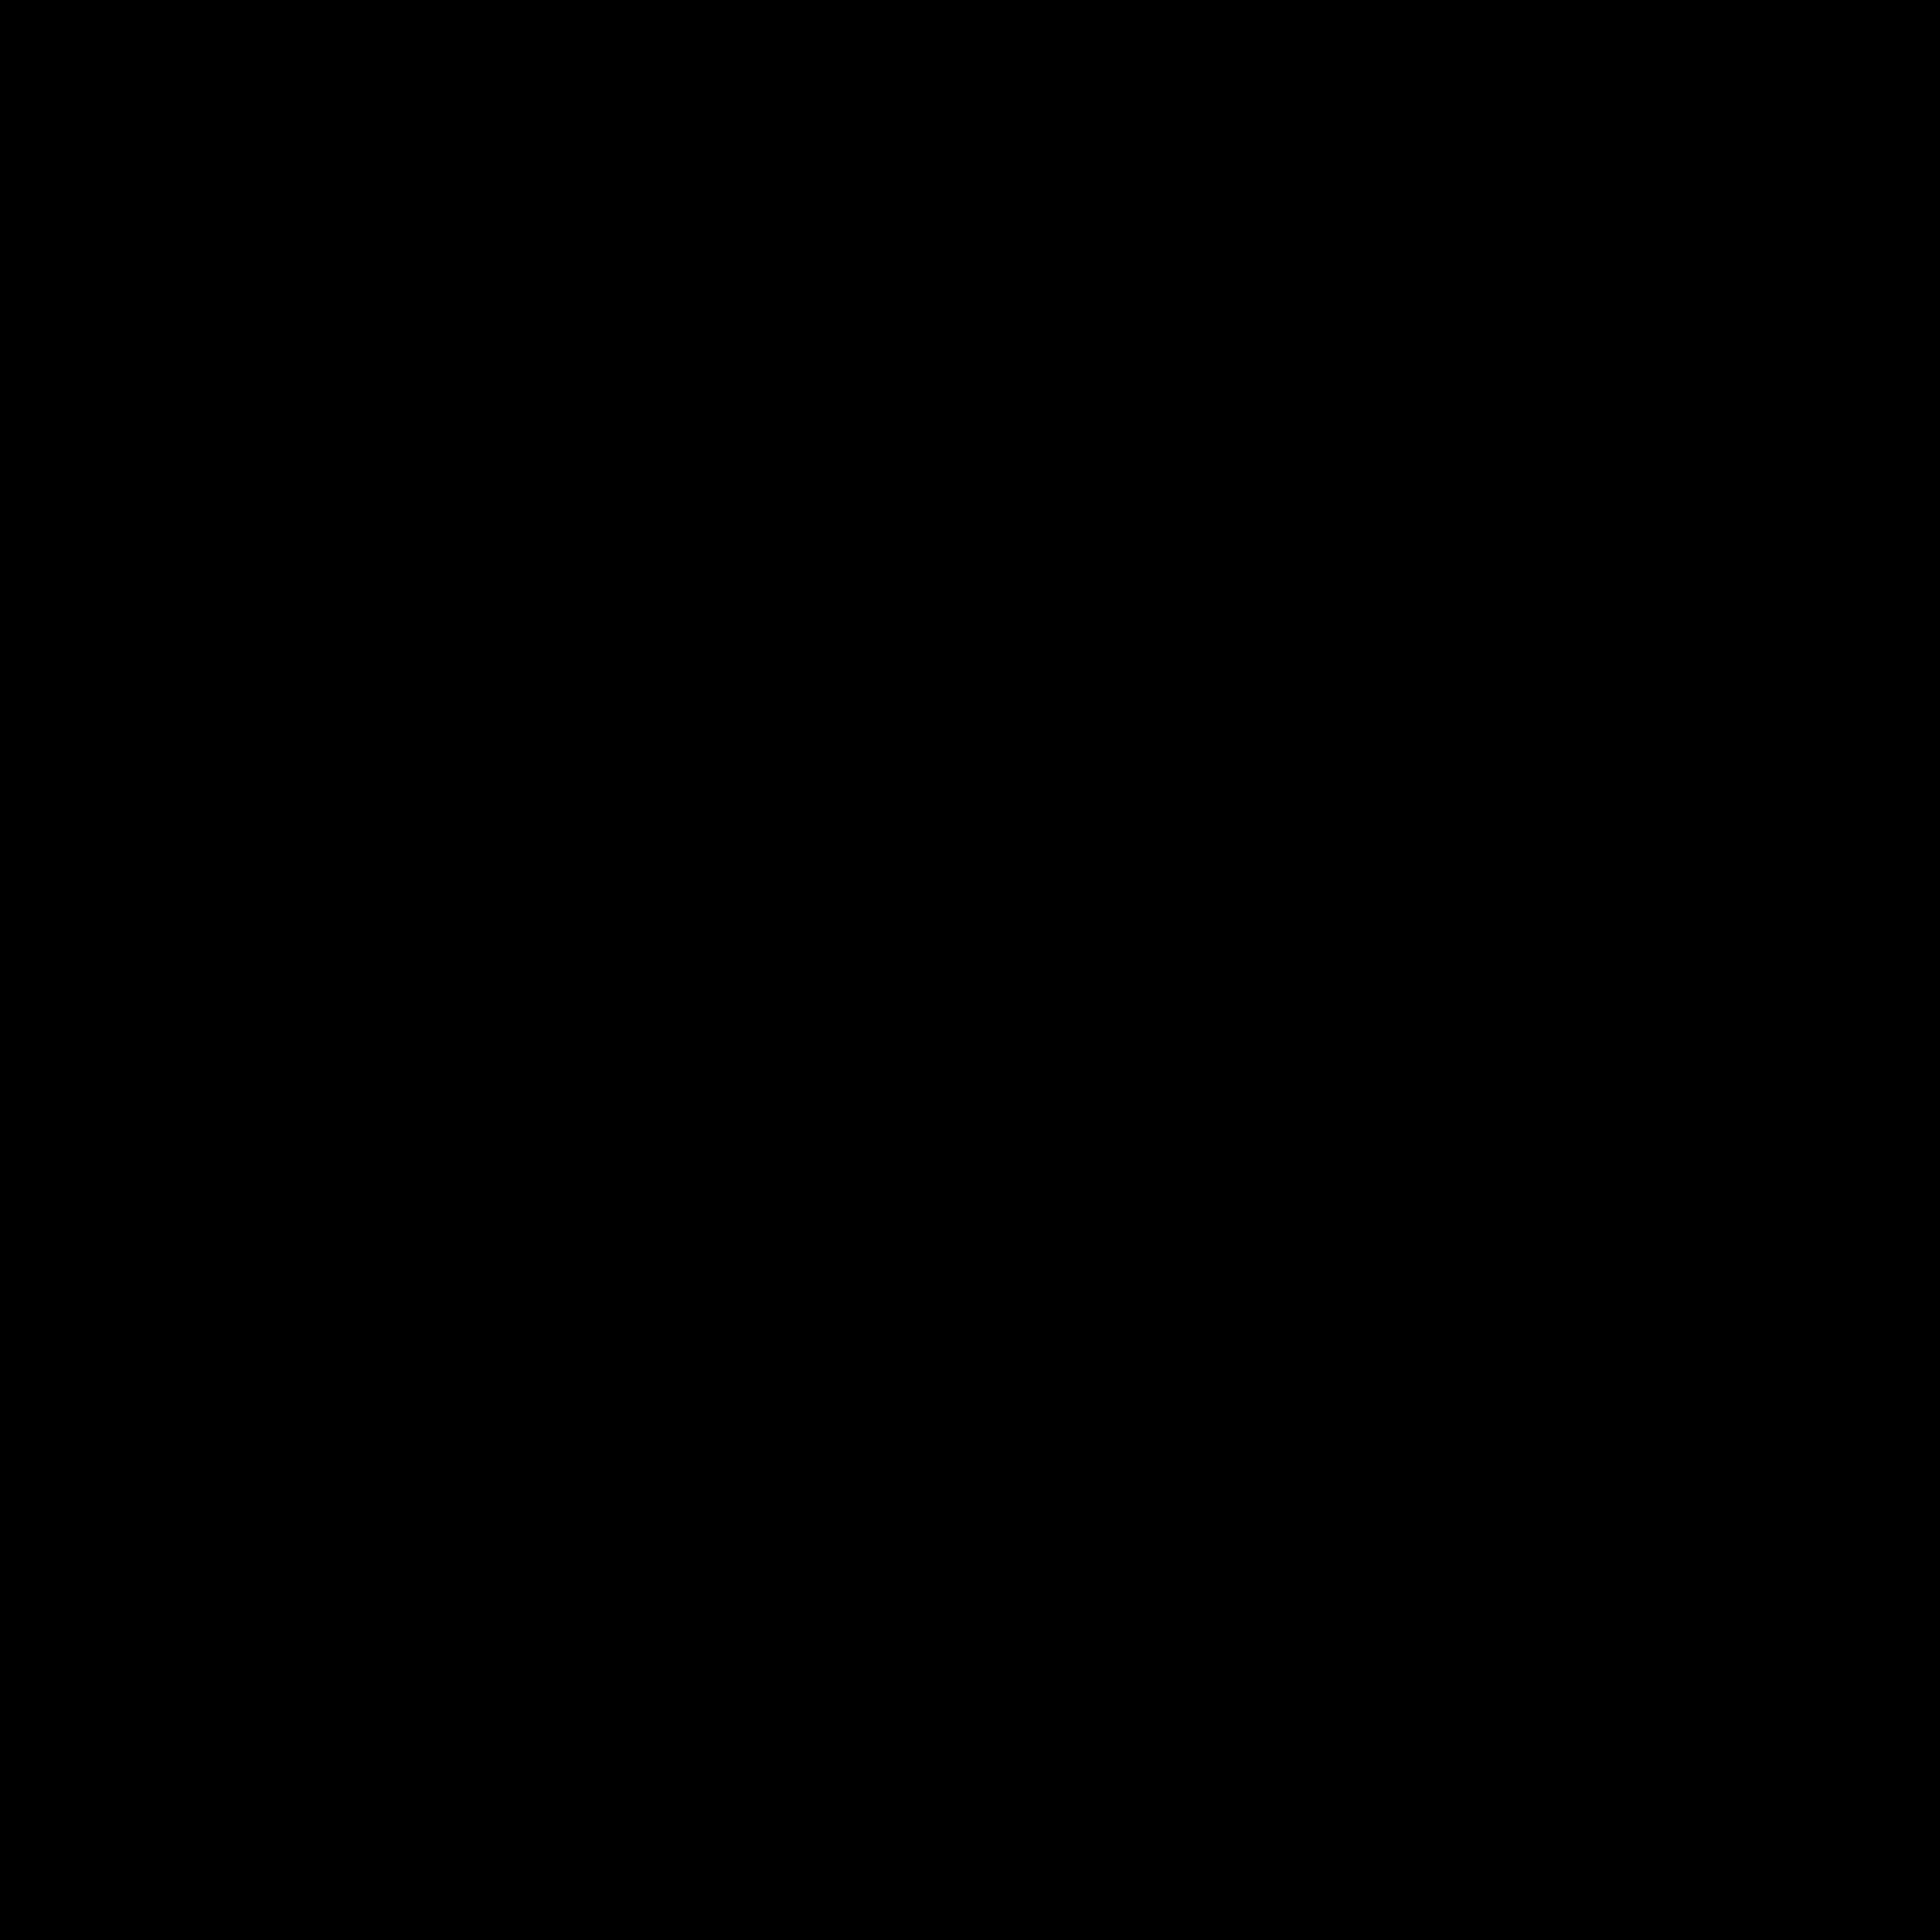 William Morris Letter J #mE4xfk.